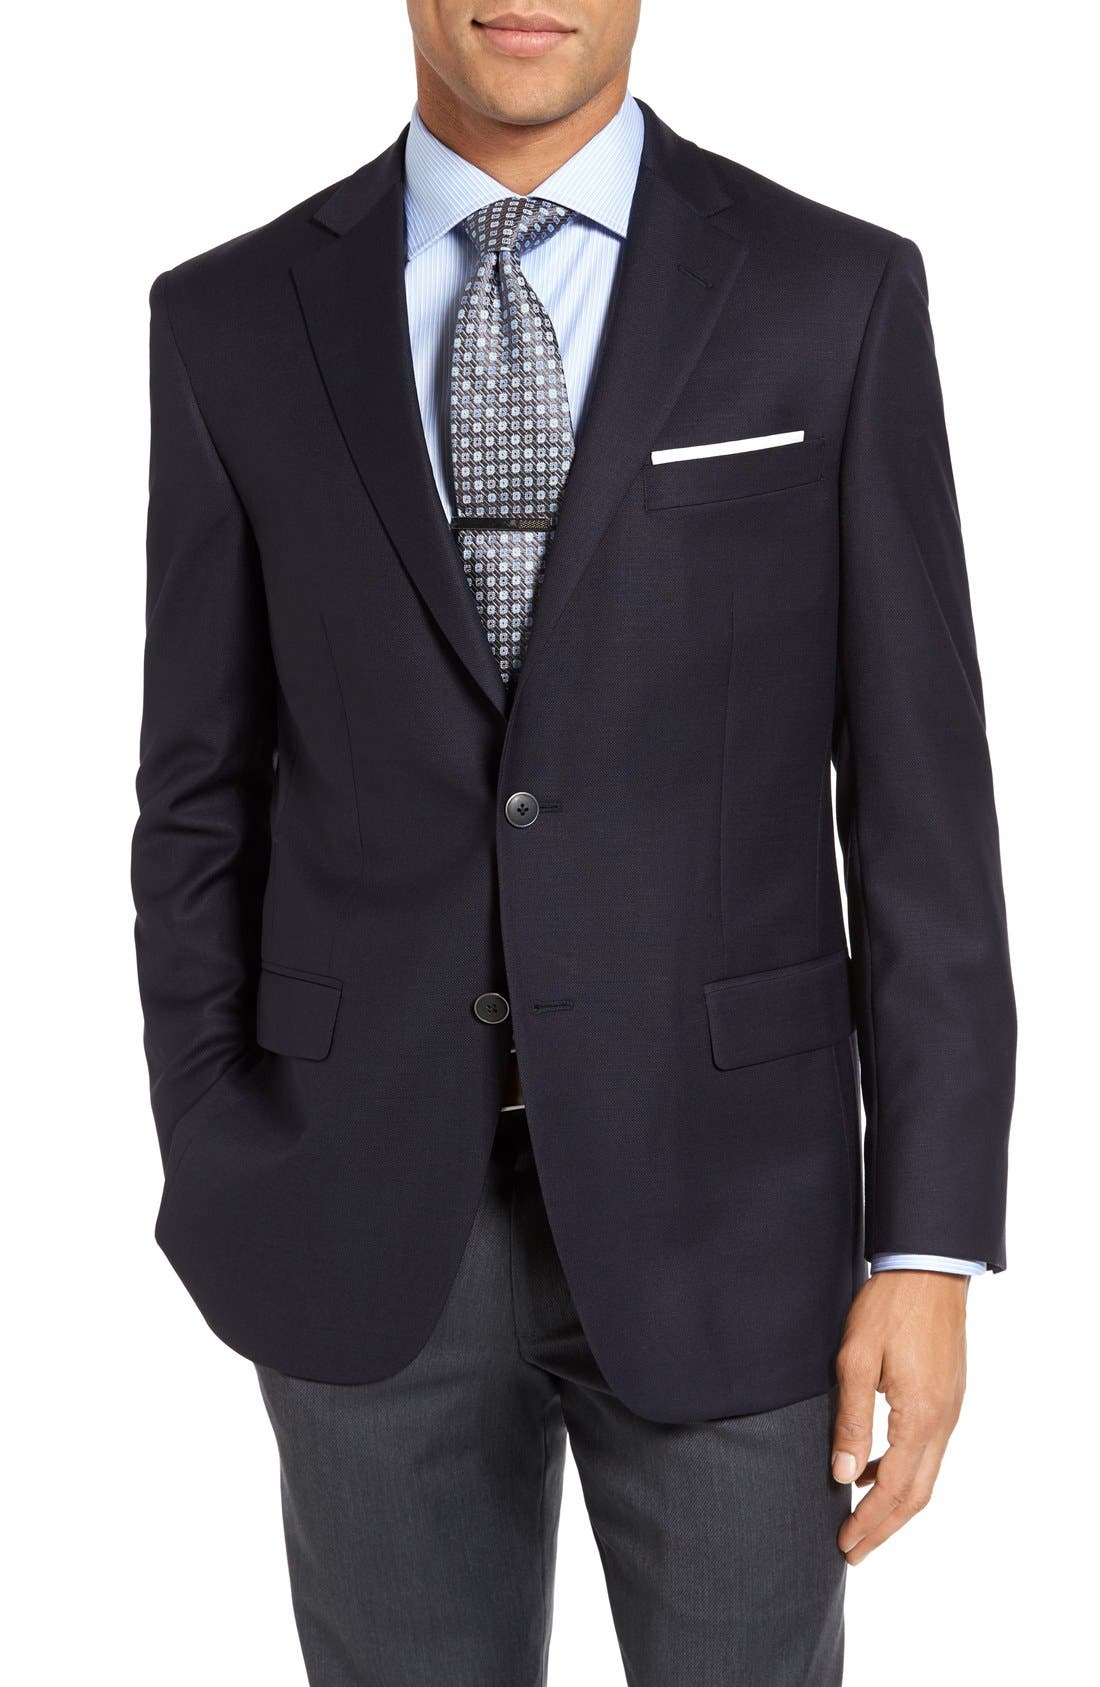 HART SCHAFFNER MARX, New York Classic Fit Wool Blend Blazer, Main thumbnail 1, color, NAVY